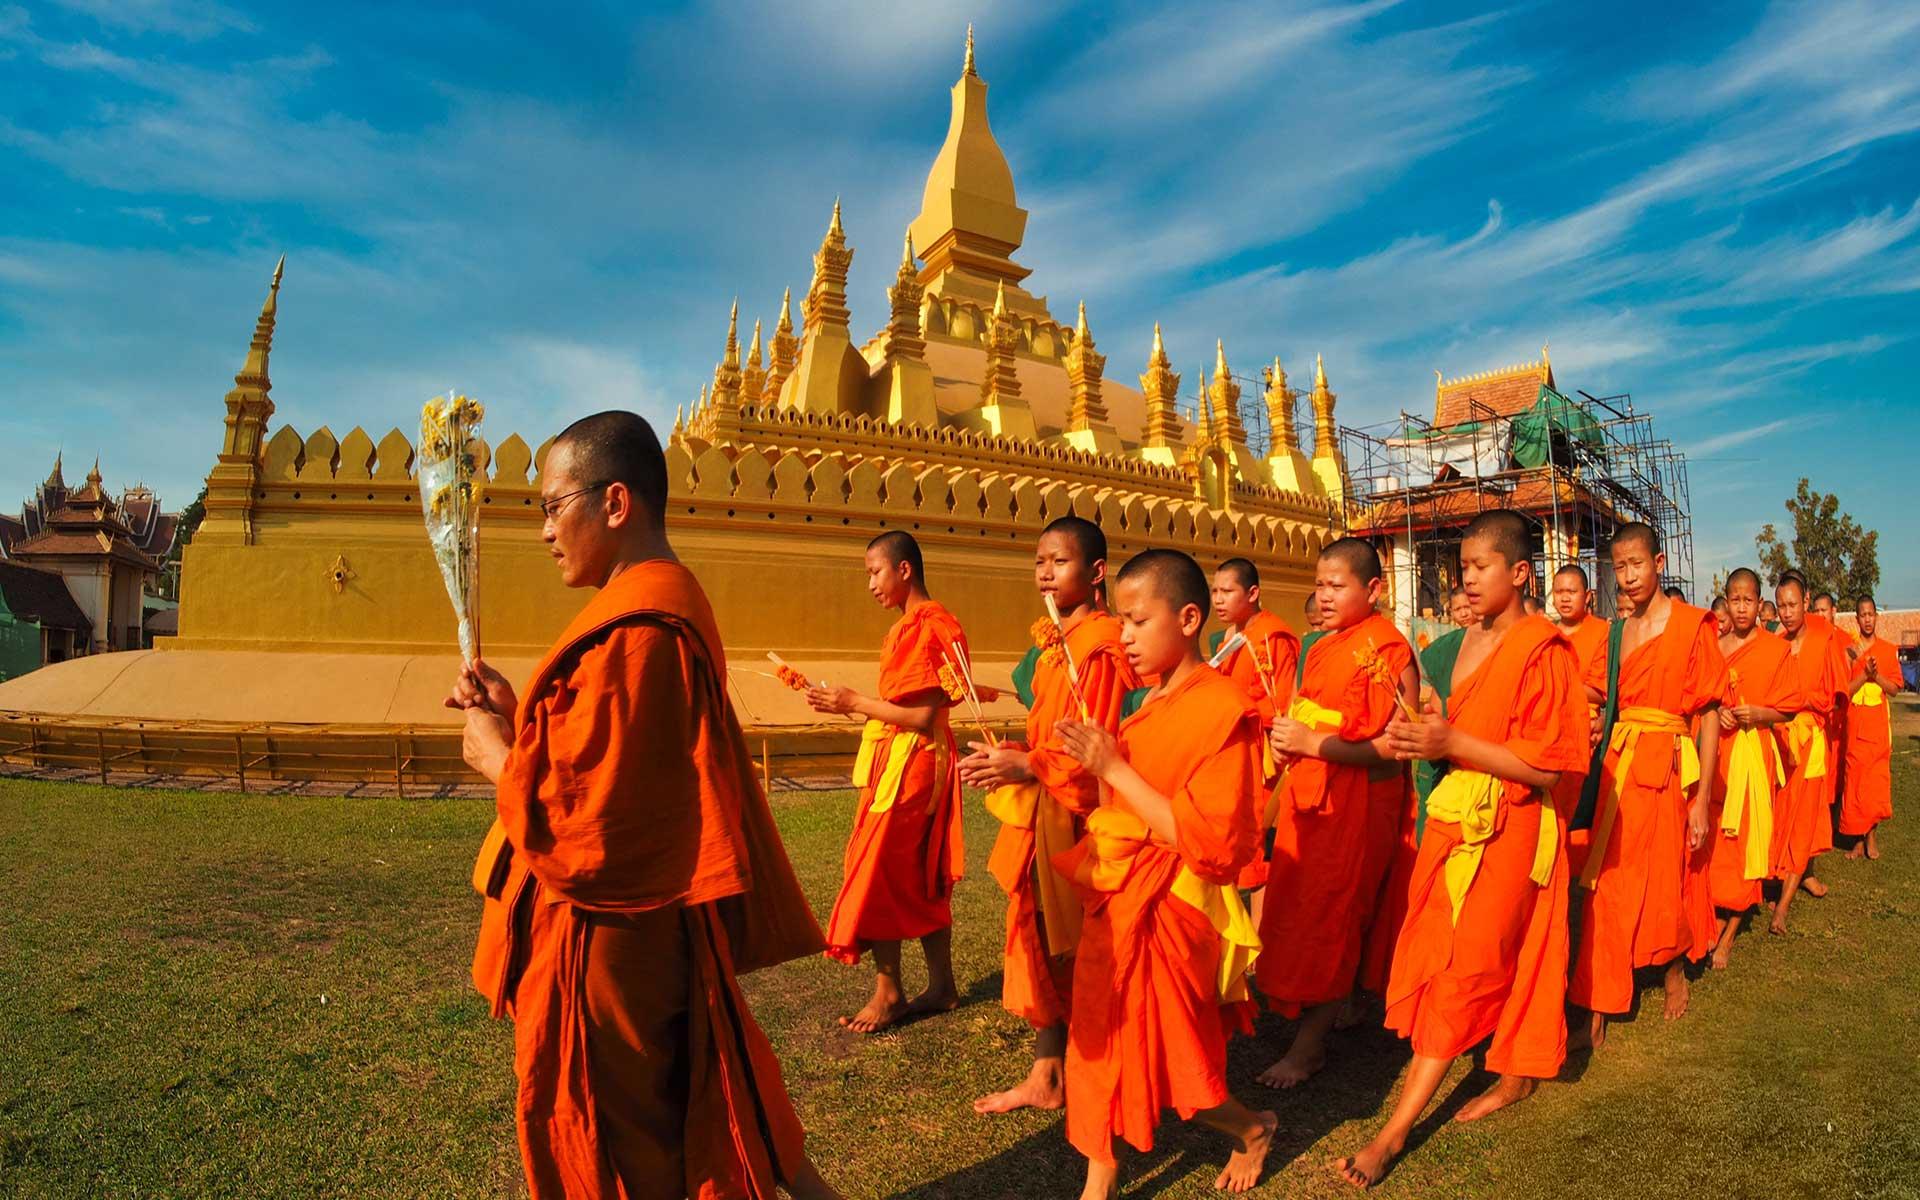 Pha That Luang Stupa in Vientiane